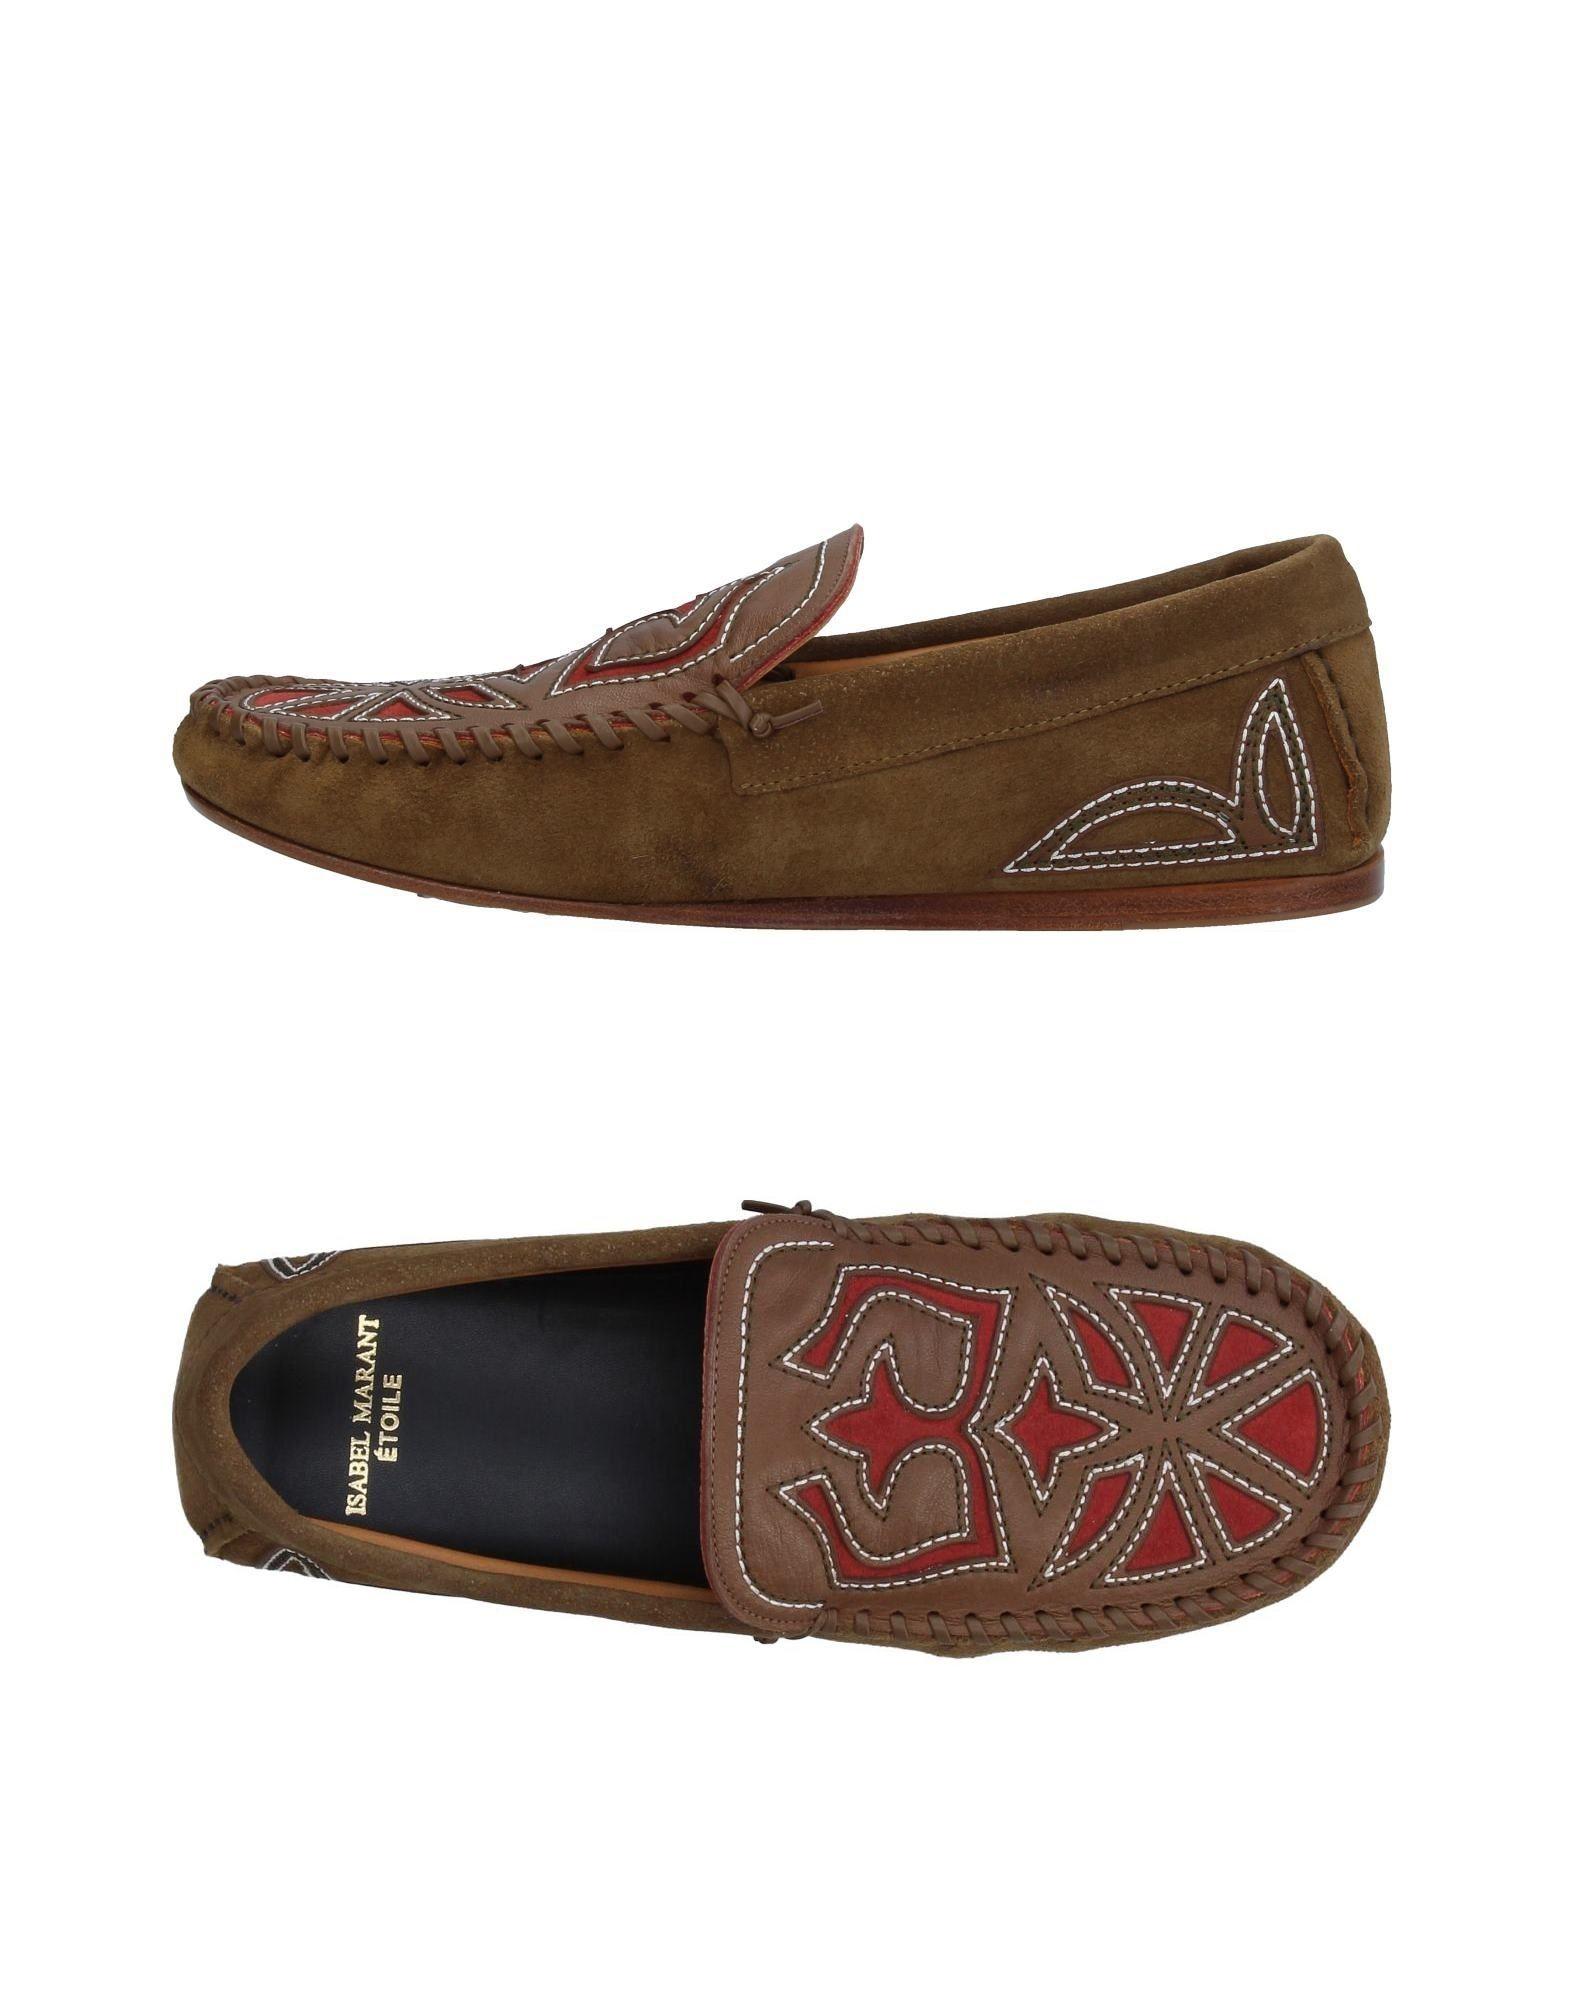 Isabel Marant Étoile Mokassins Damen  11365252JFGut aussehende strapazierfähige Schuhe